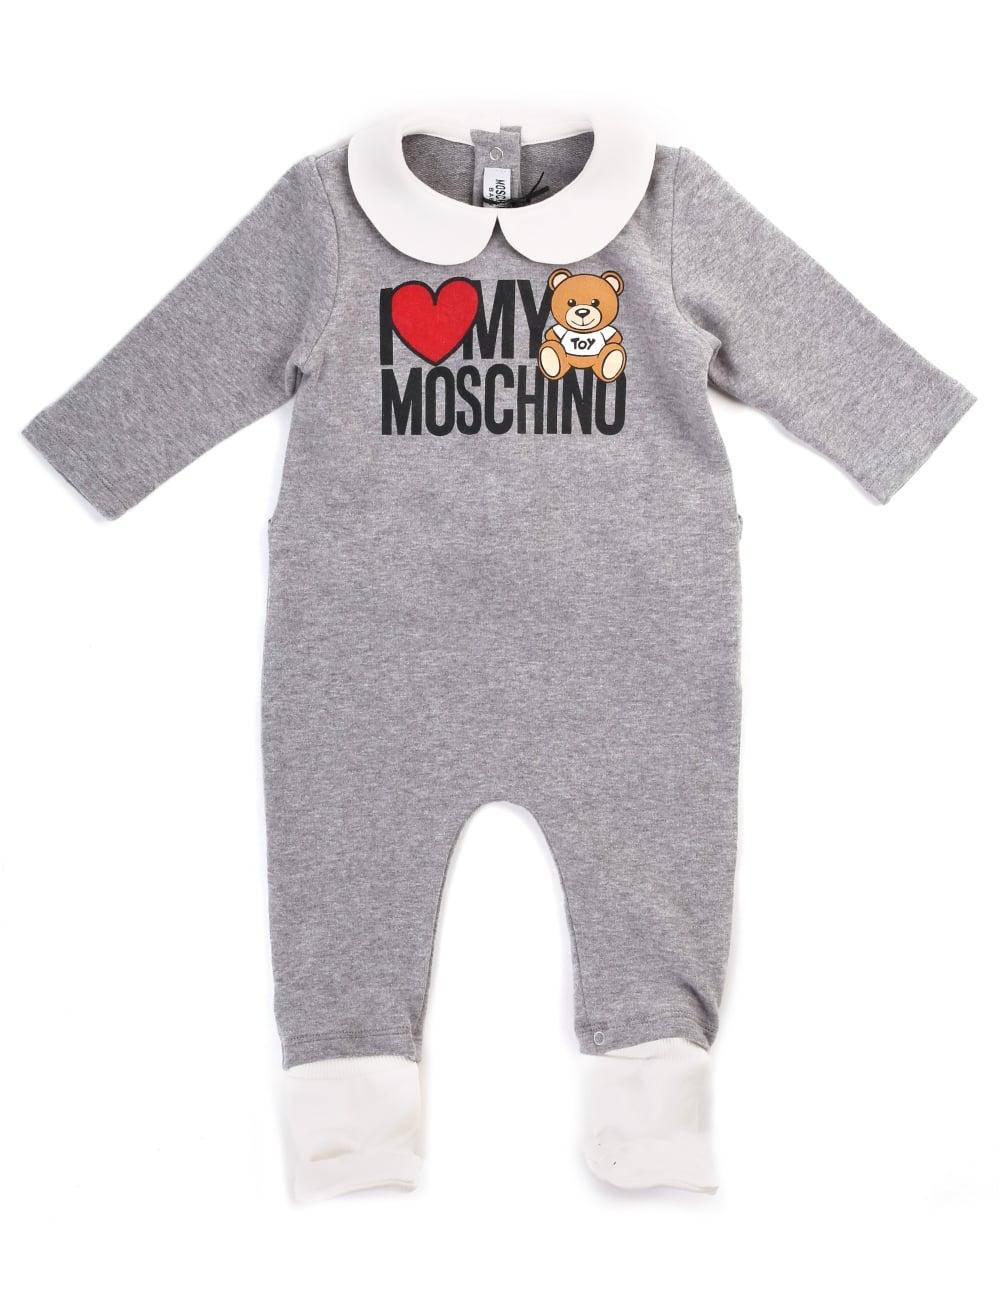 8b19b1399bf Moschino Baby Boy I Love Moschino Baby Grow